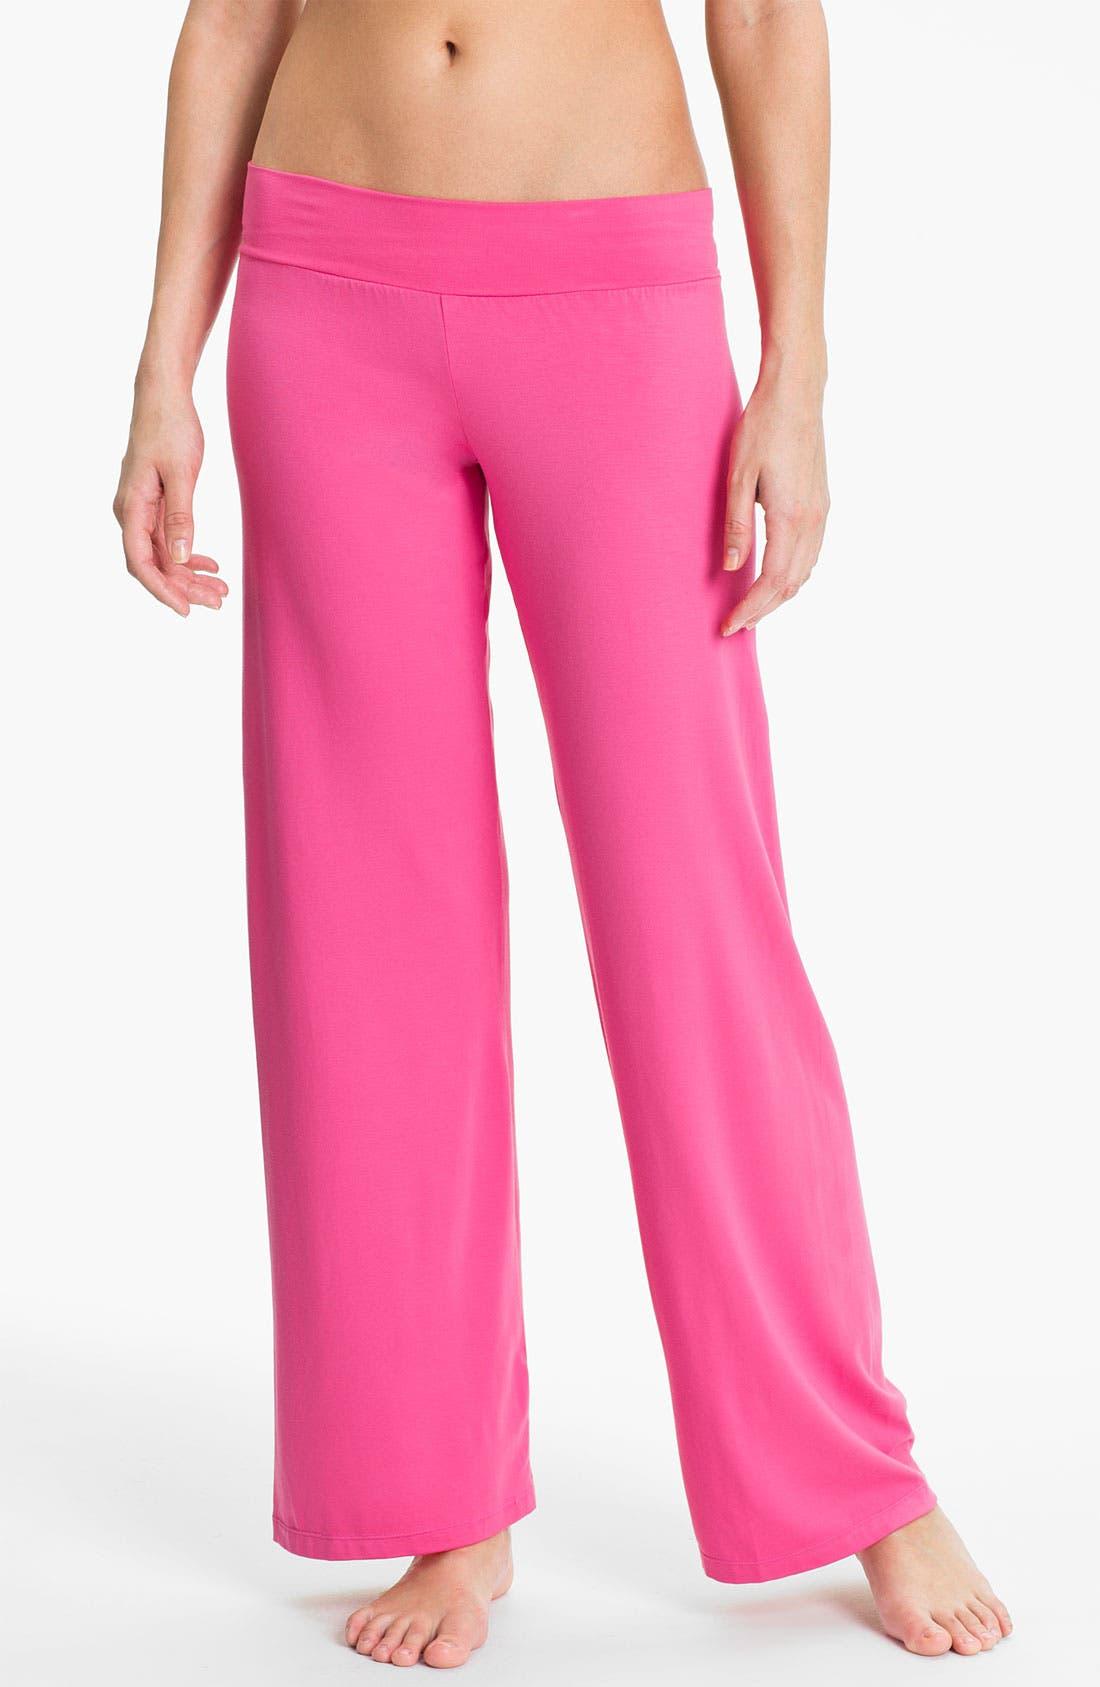 Alternate Image 1 Selected - Cosabella 'Talco' Lounge Pants